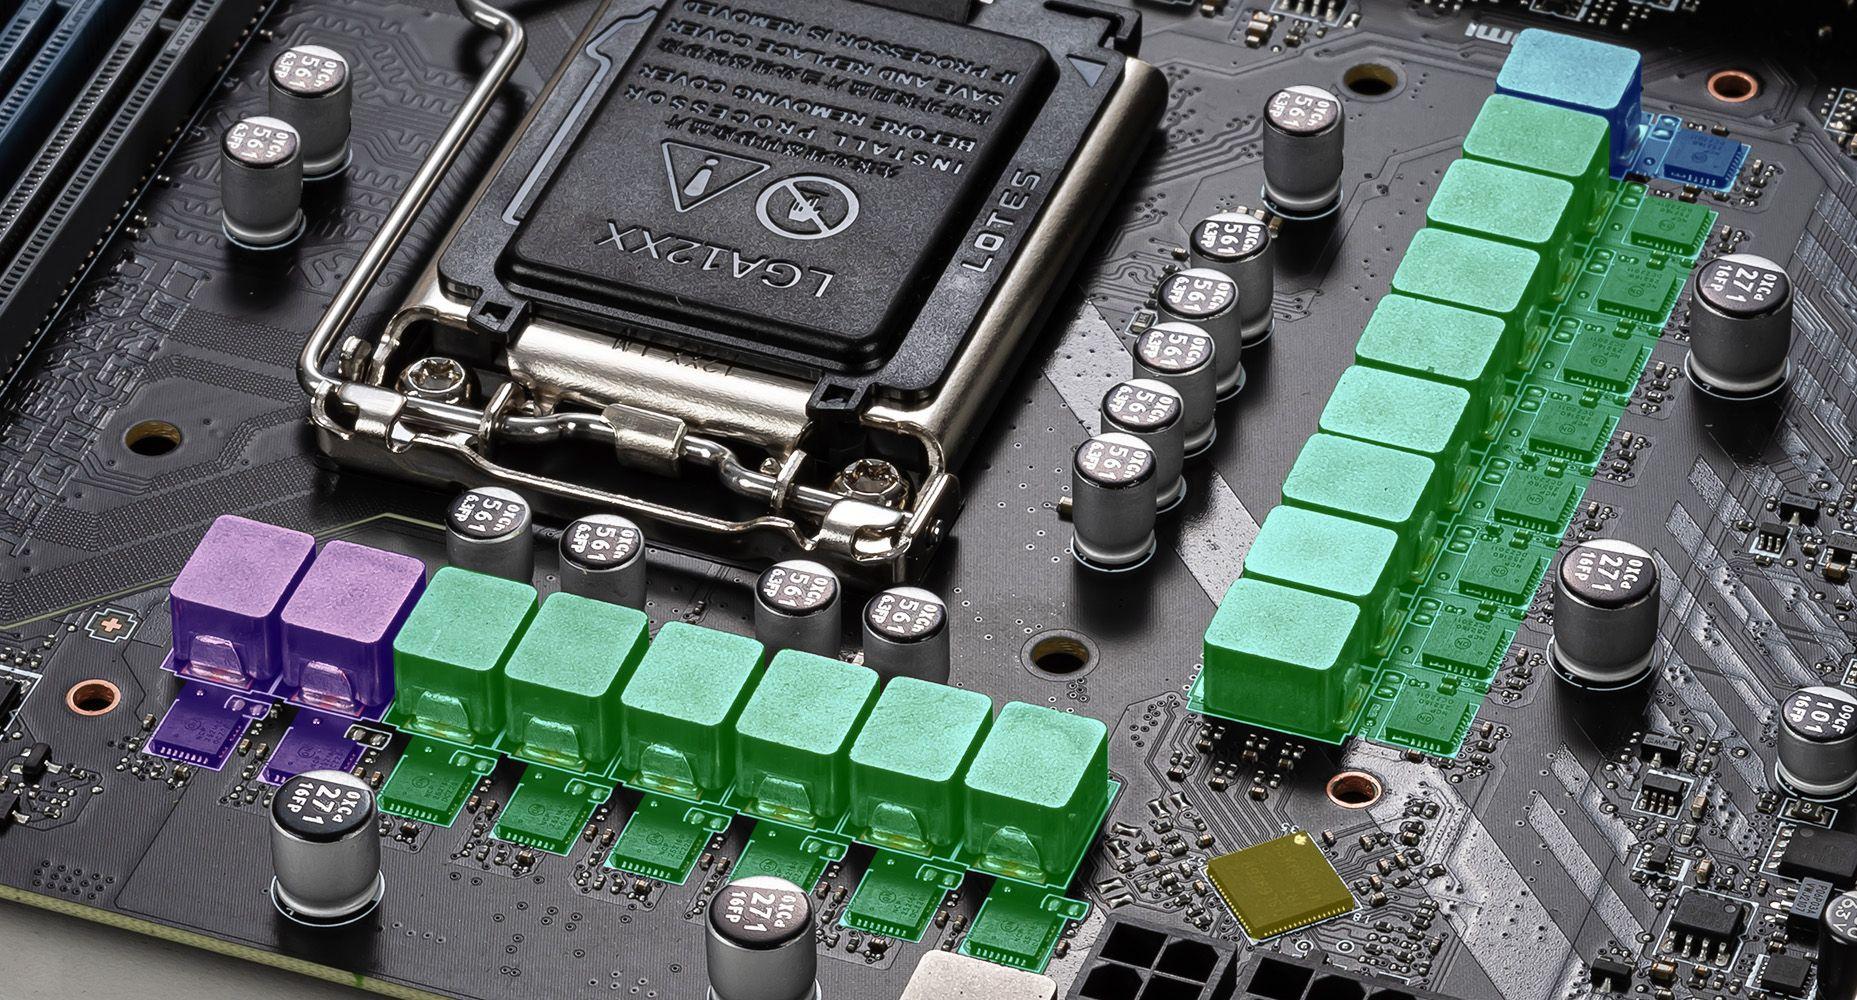 MSI MAG Z590 TORPEDO DUET RAIL POWER SYSTEM